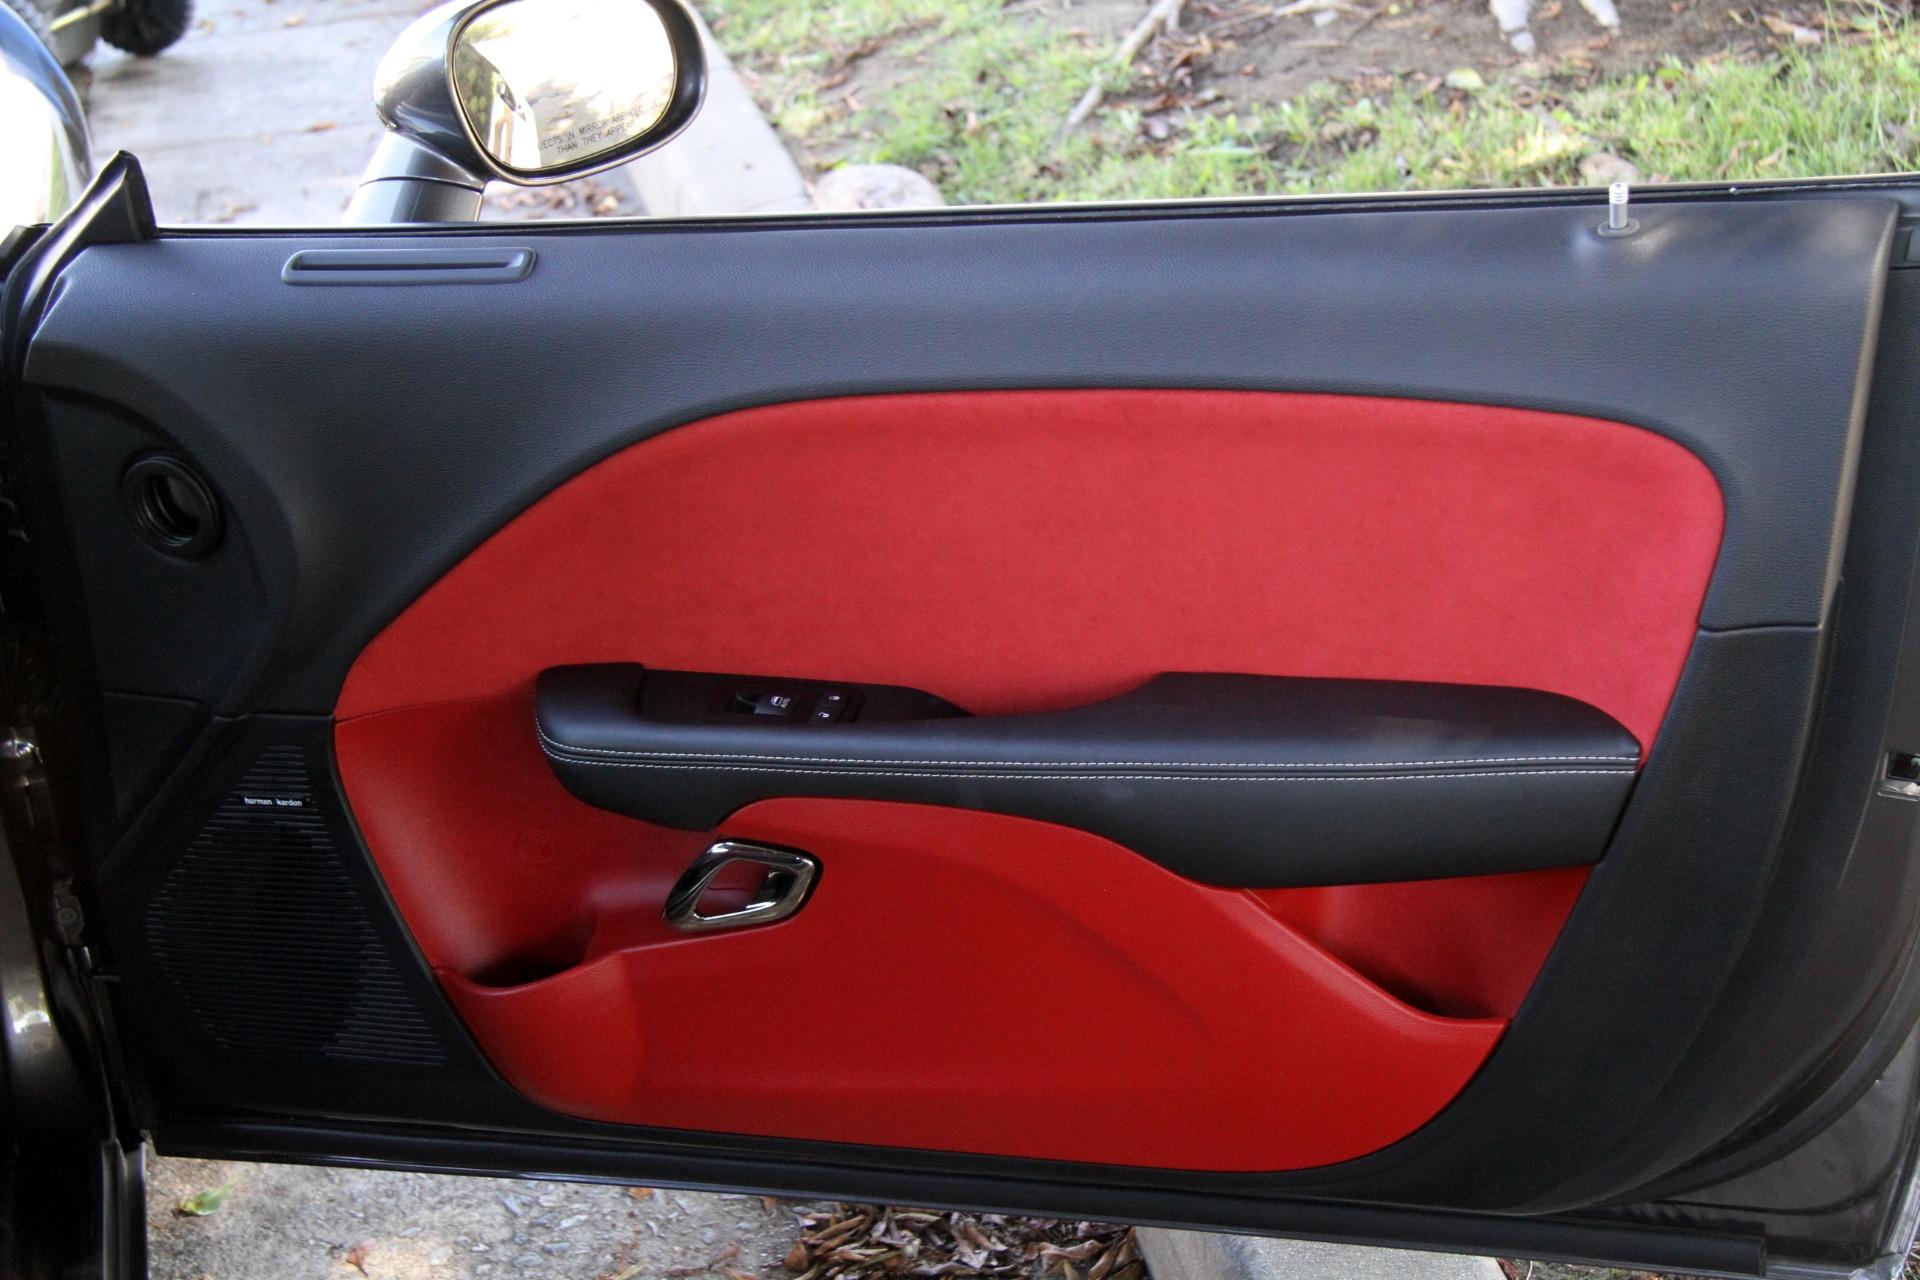 Dodge Challenger For Sale Near Me >> 2015 Dodge Challenger SRT Hellcat Stock # 6281 for sale ...